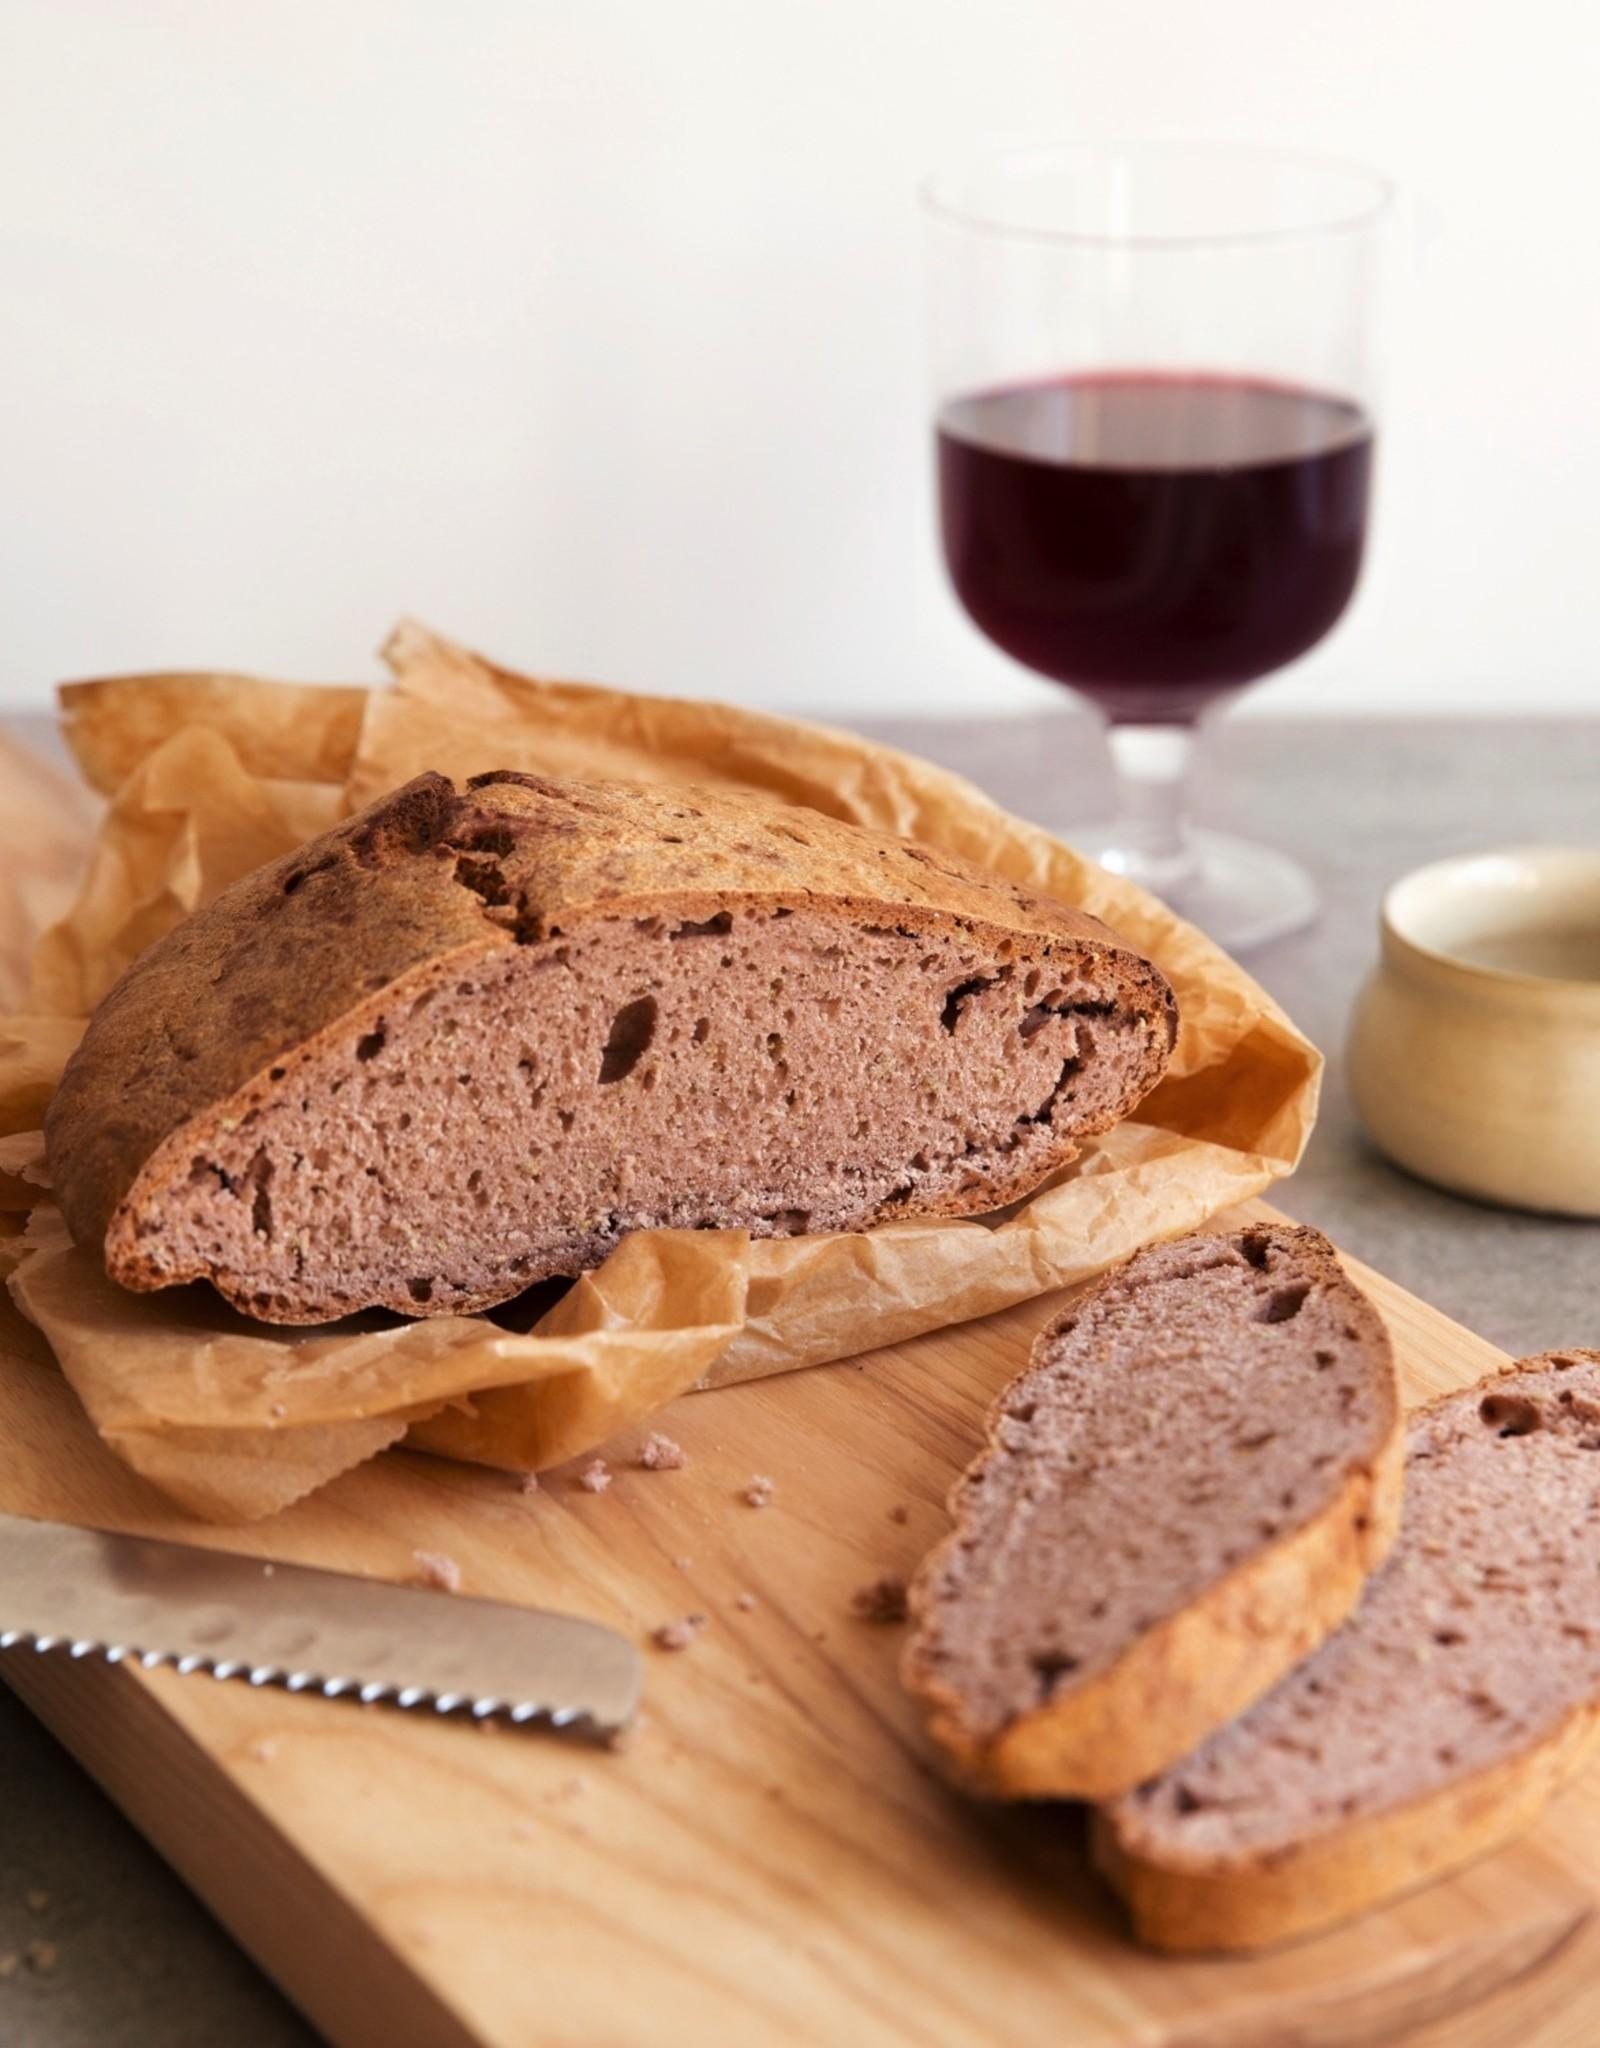 Pineut Likeur Pineut Brievenbusdoos-borrelbrood/wijnbrood